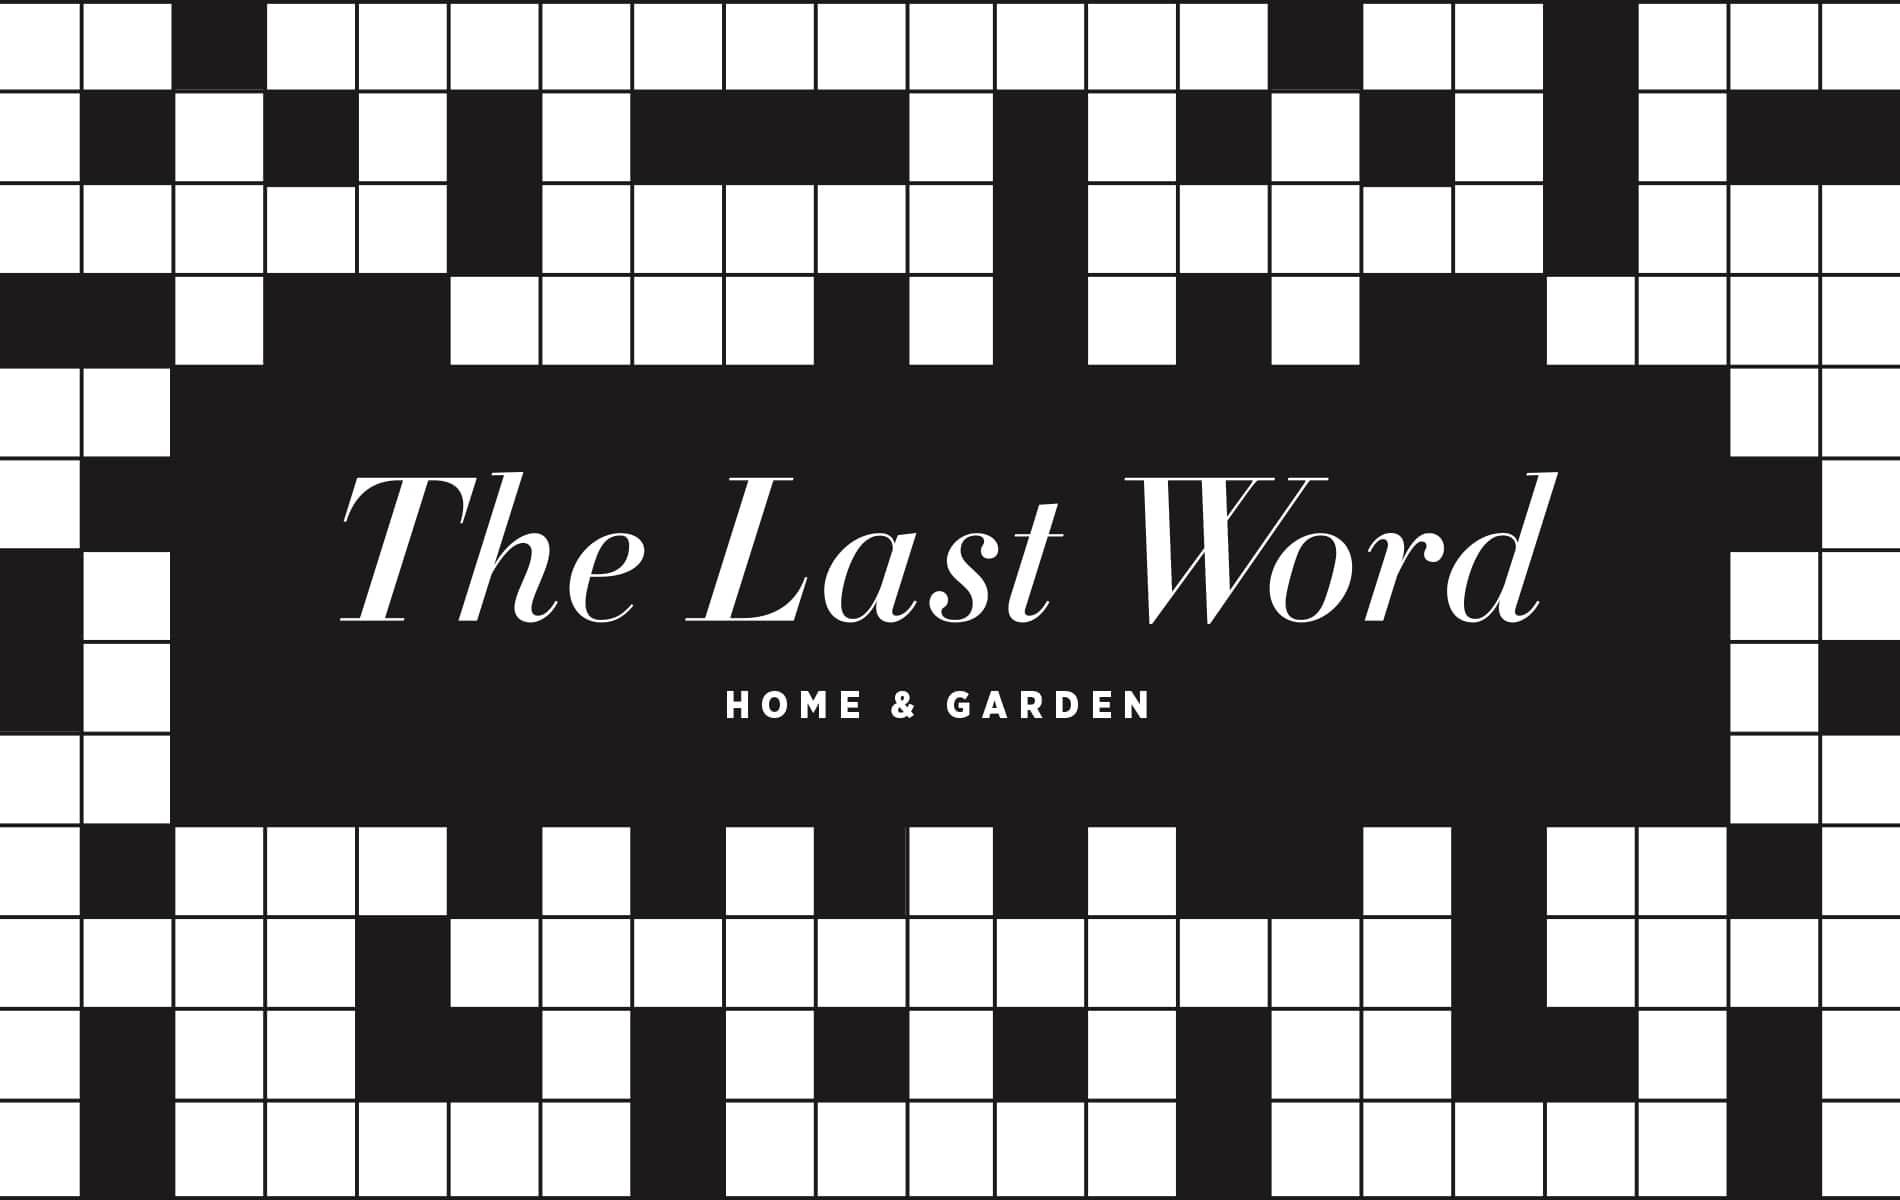 VIE Magazine October 2019 Home & Garden Issue Crossword Puzzle